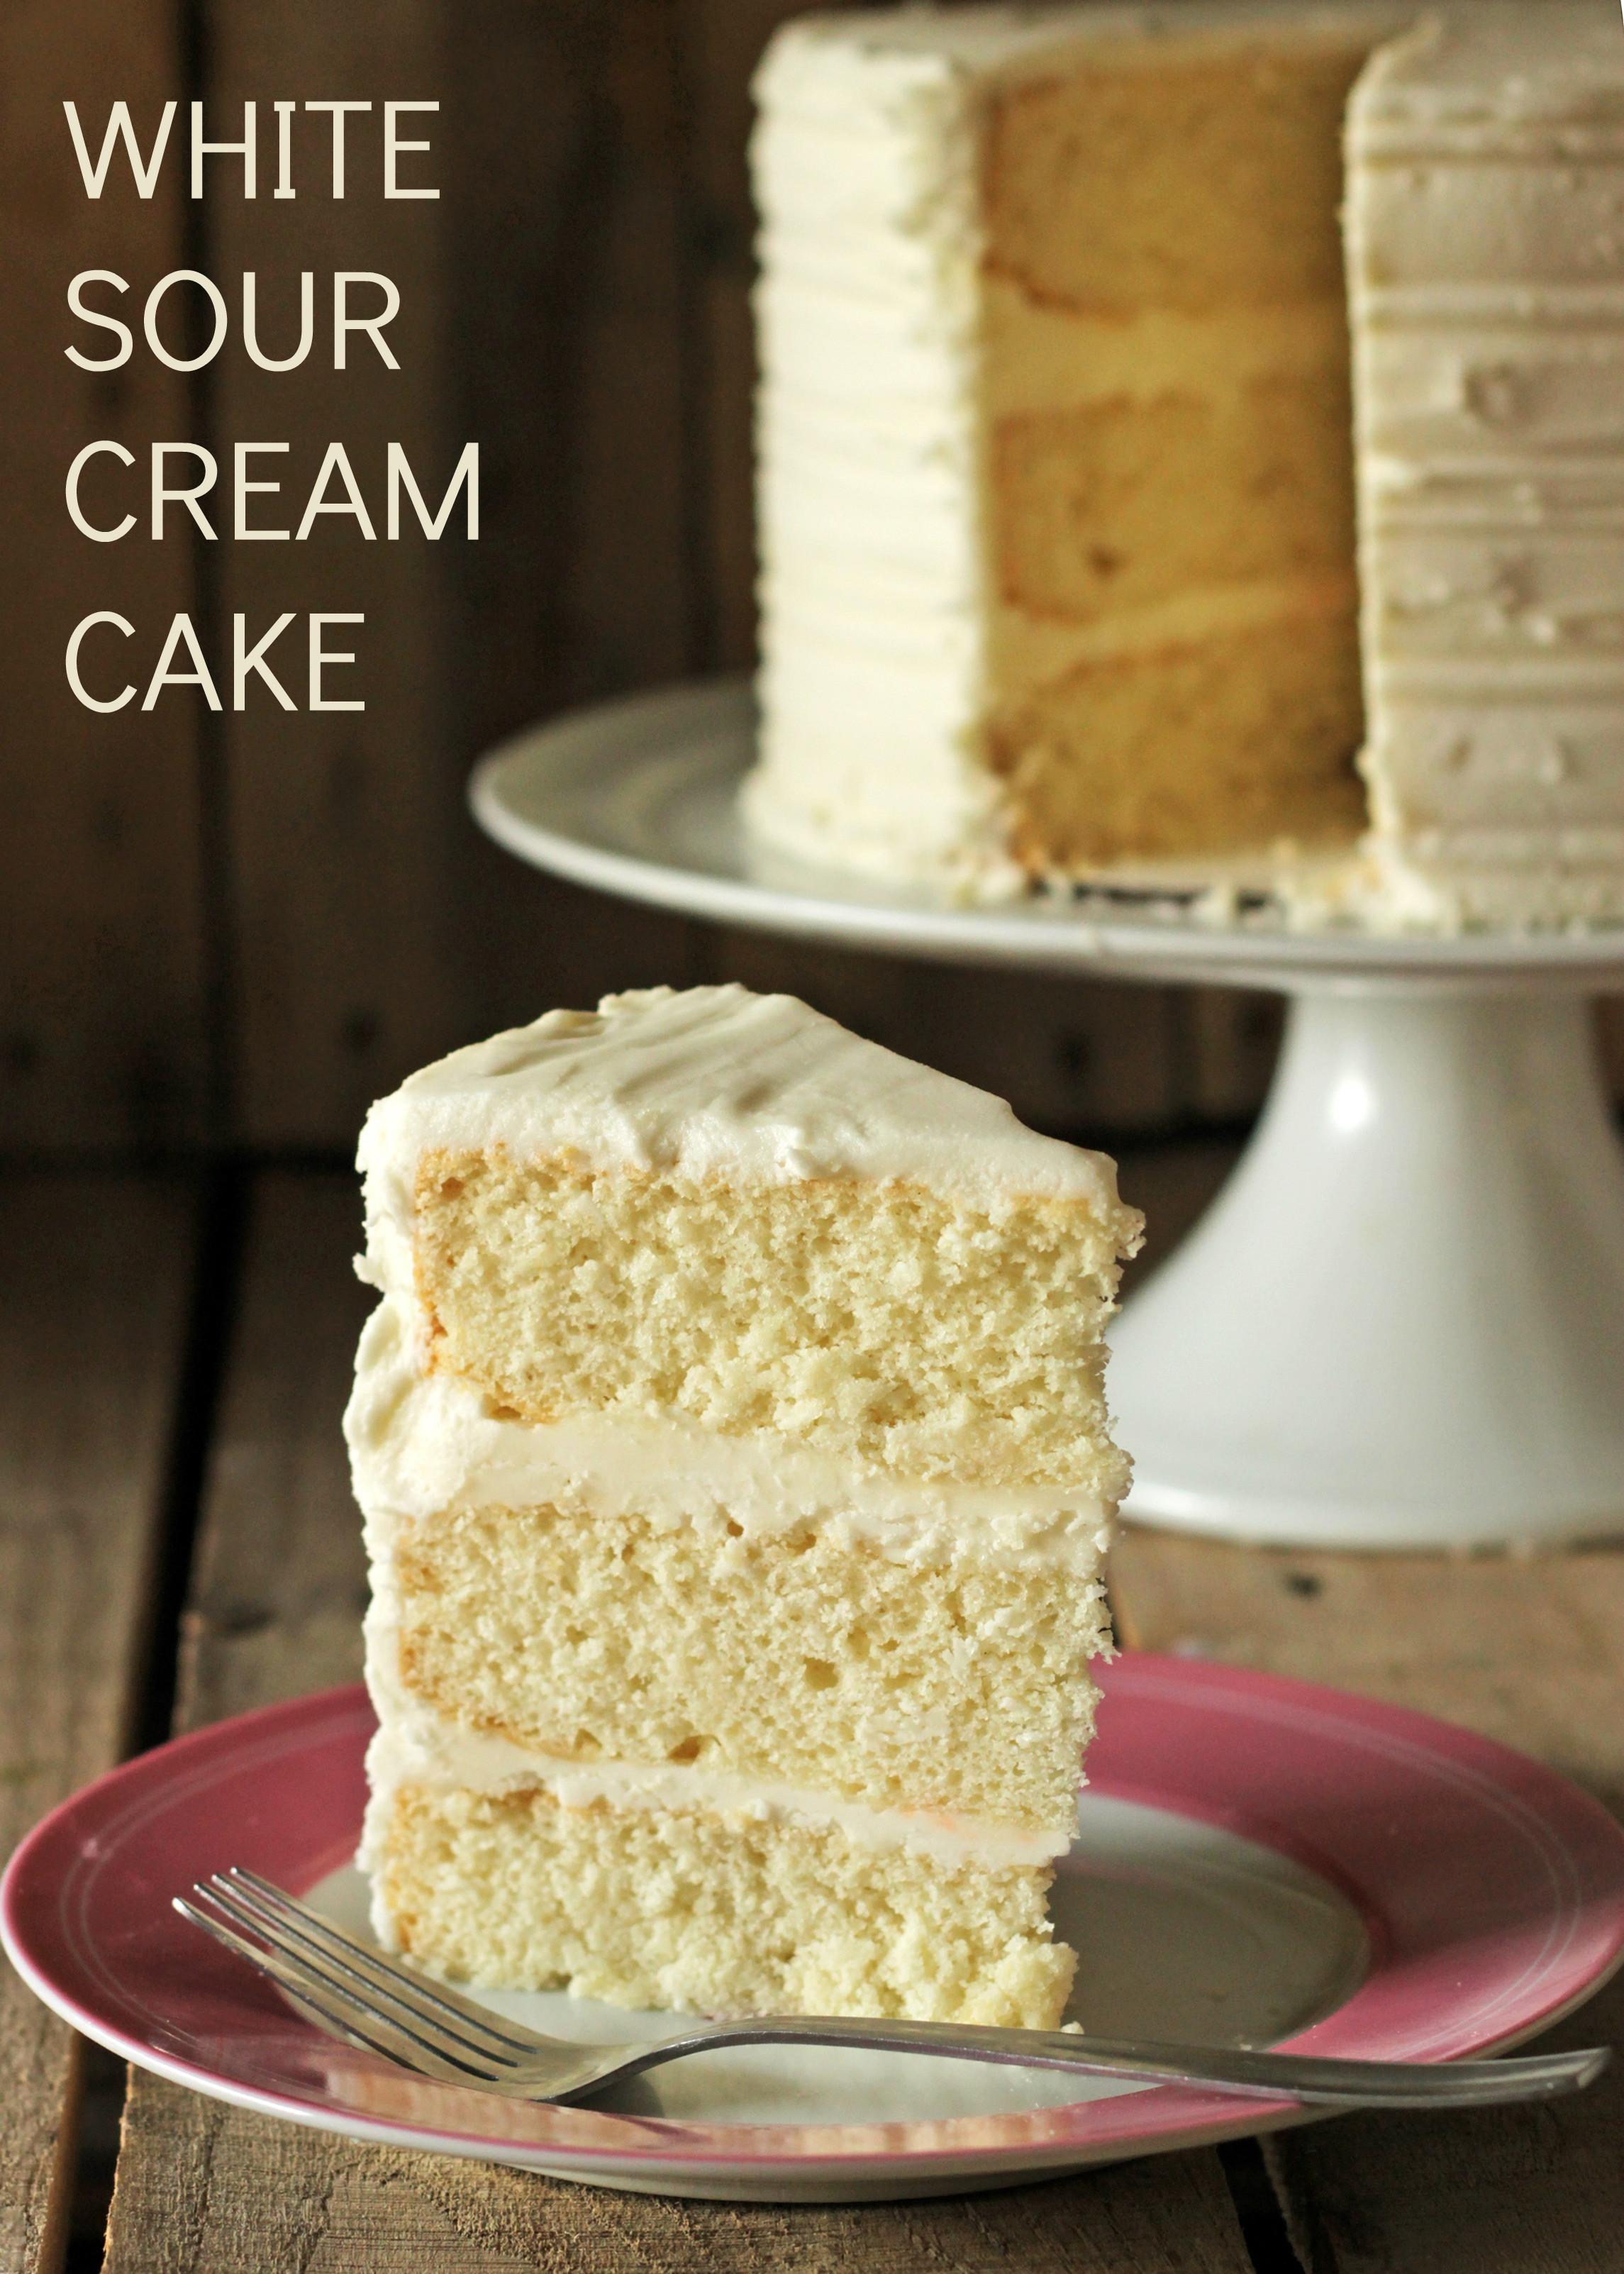 Wedding Cake Recipe Using Cake Mix  White Sour Cream Cake Recipe • CakeJournal